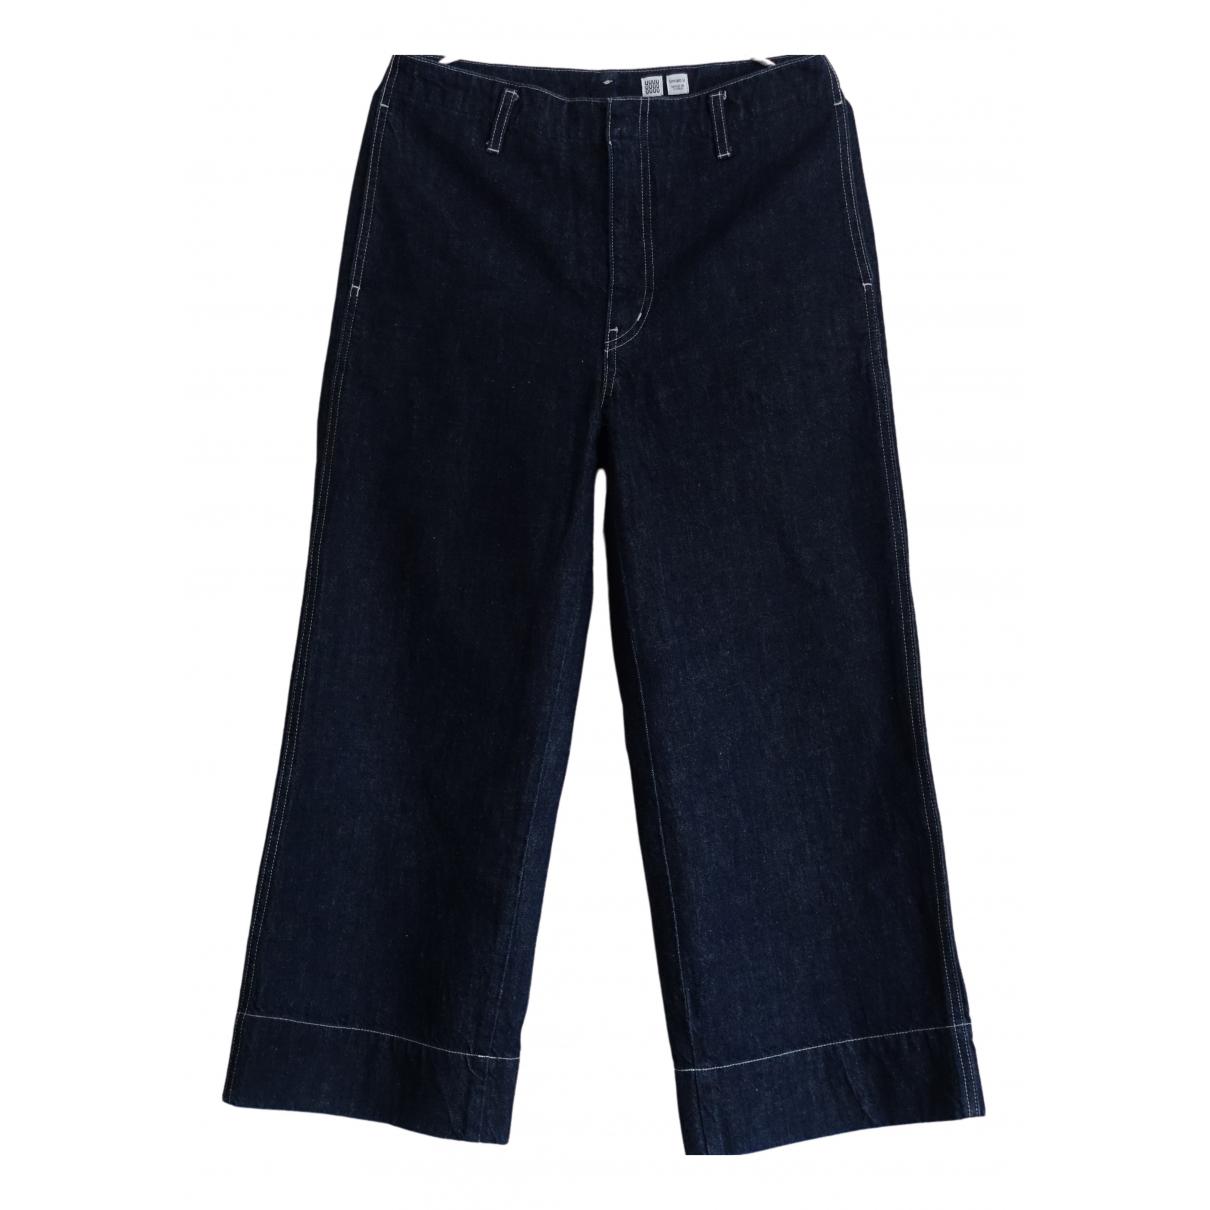 Uniqlo N Blue Denim - Jeans Trousers for Women S International